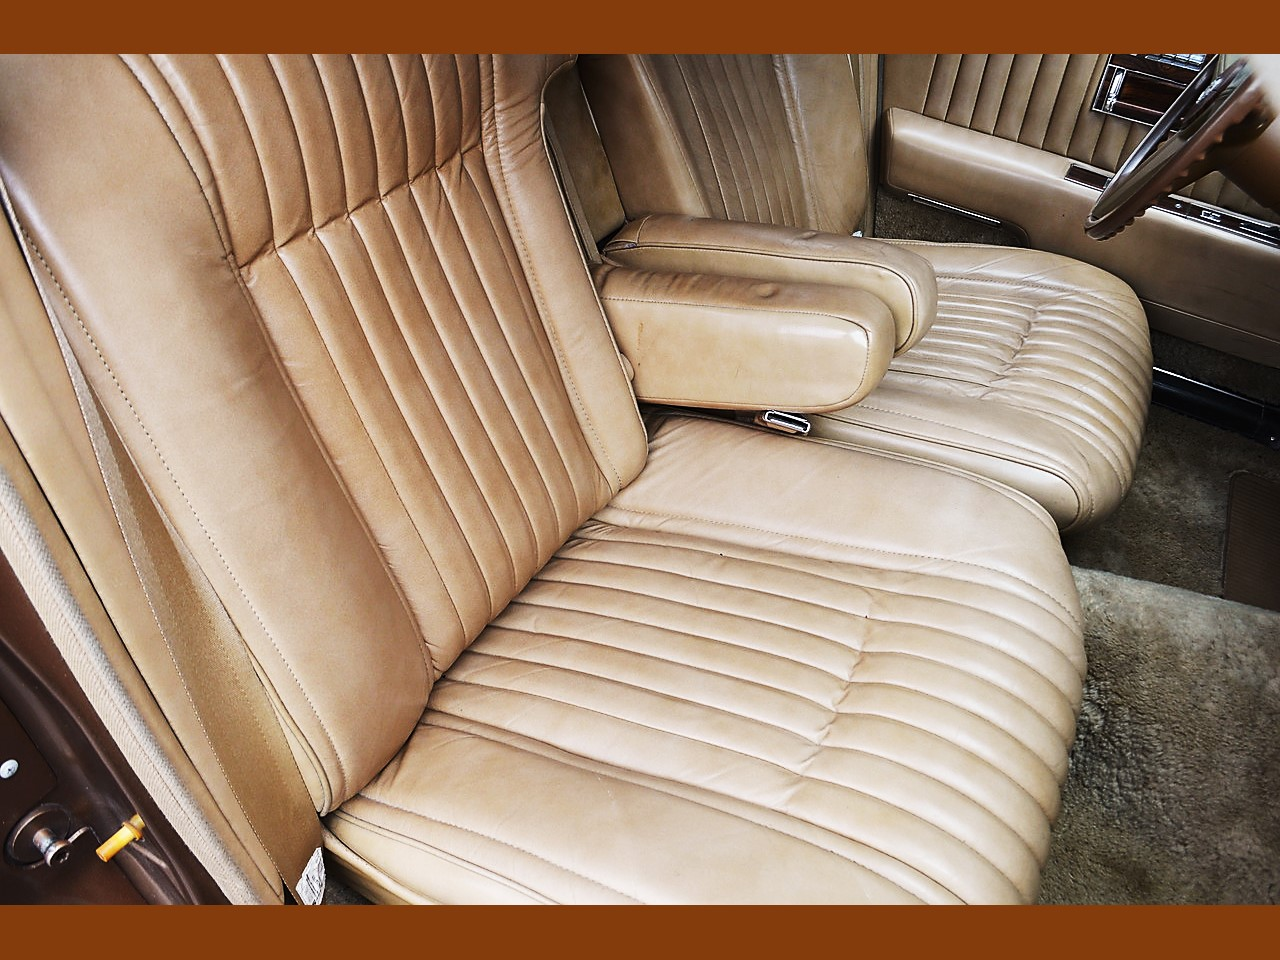 1976 Cadillac Seville 27